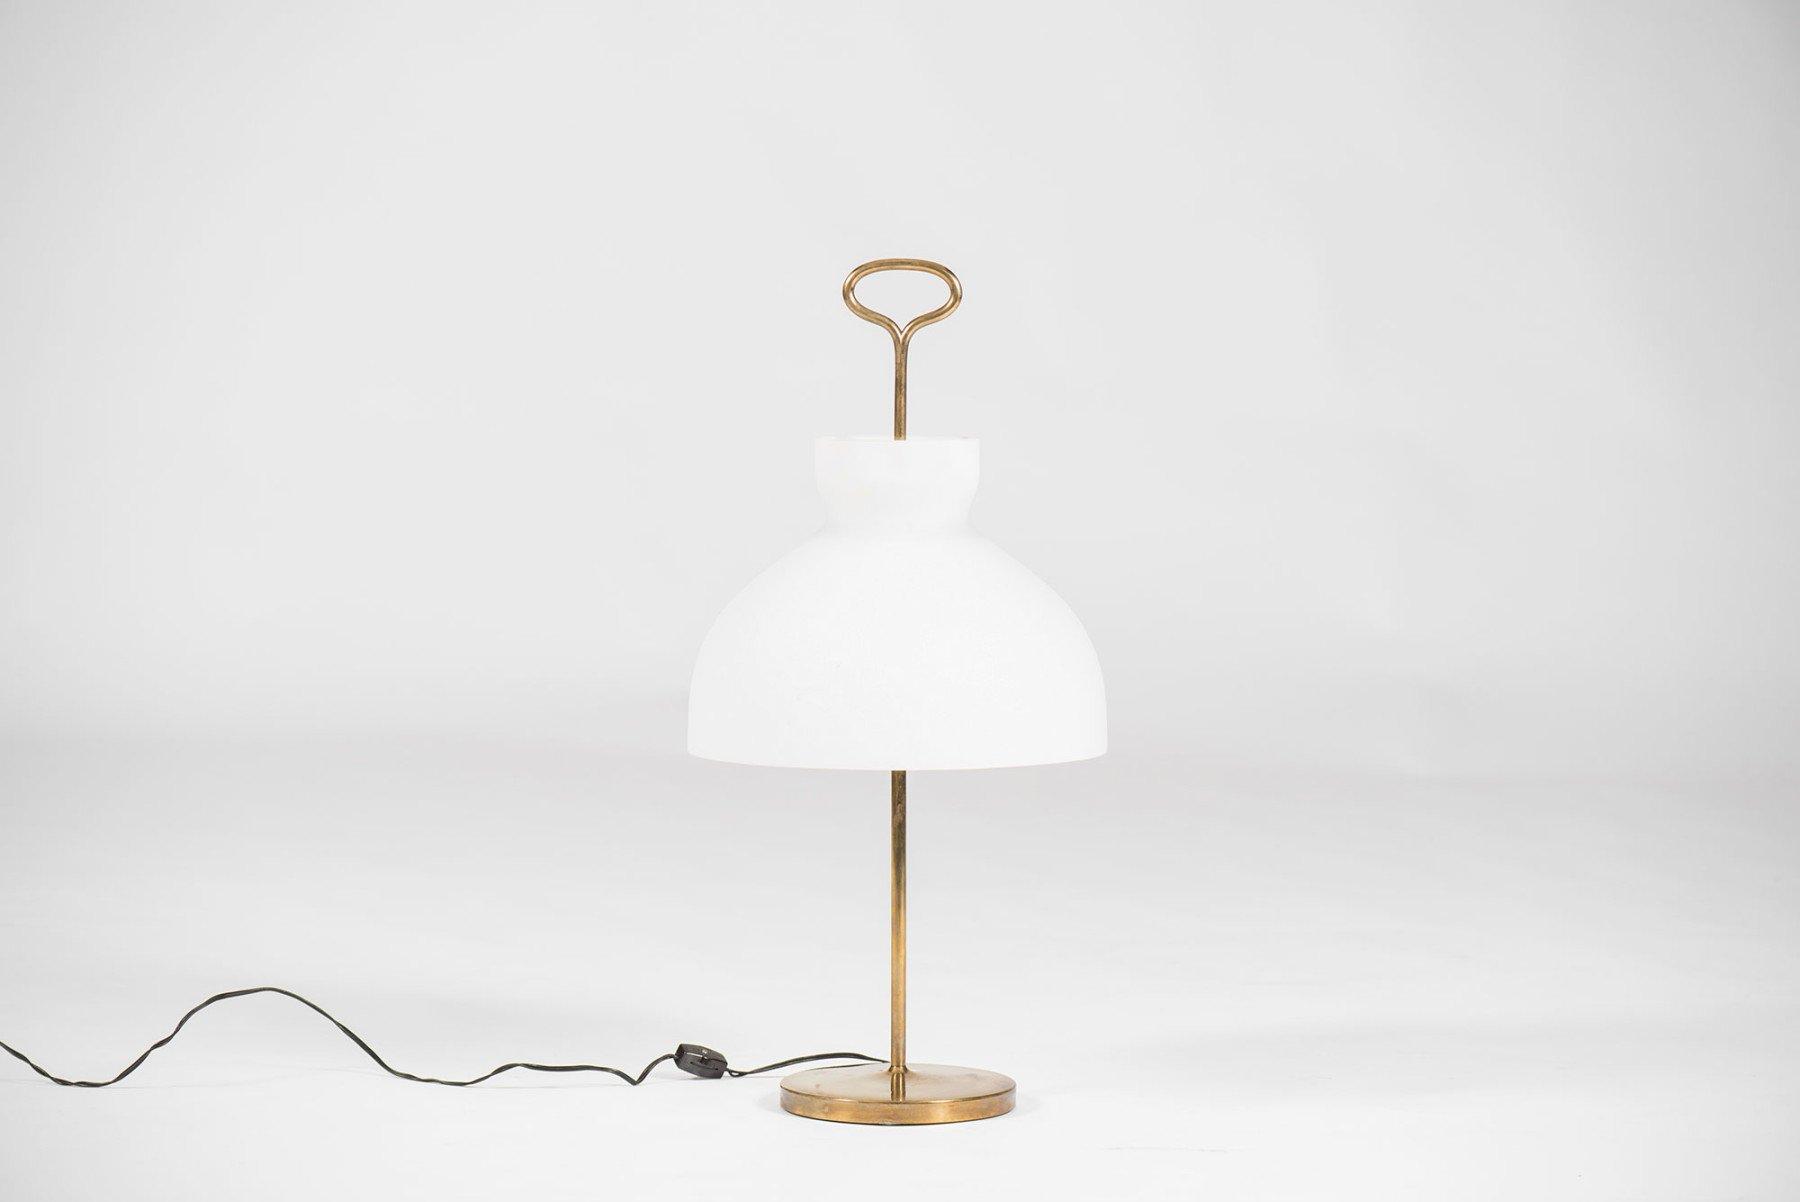 Ignazio Gardella     Table lamp, model Lta 3